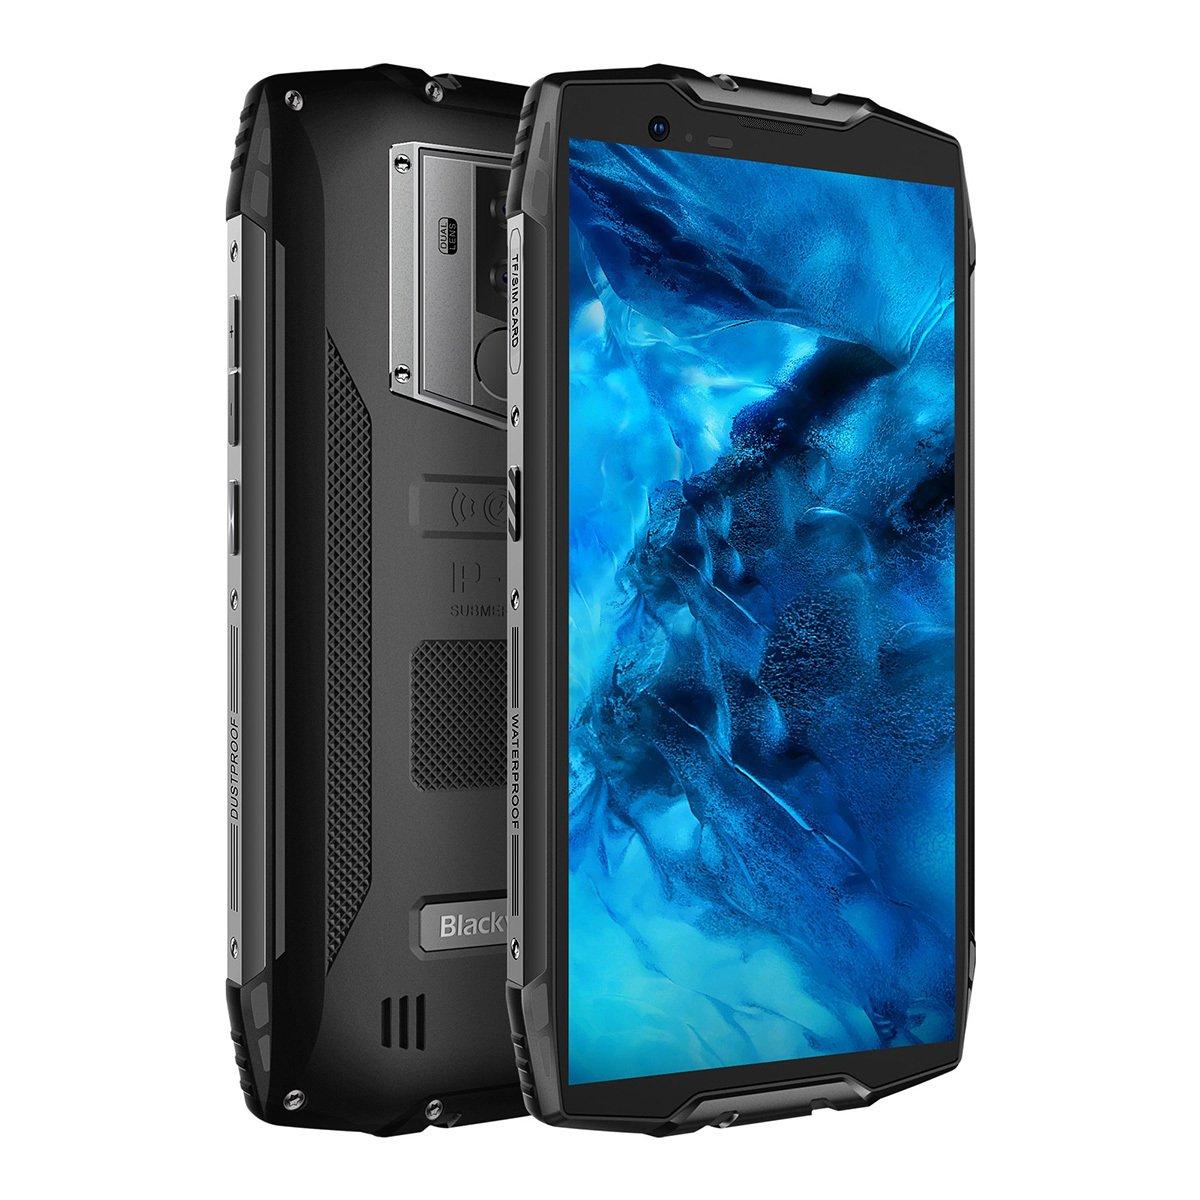 Смартфон Blackview BV6800 Pro 4/64Gb DS Black фото 4